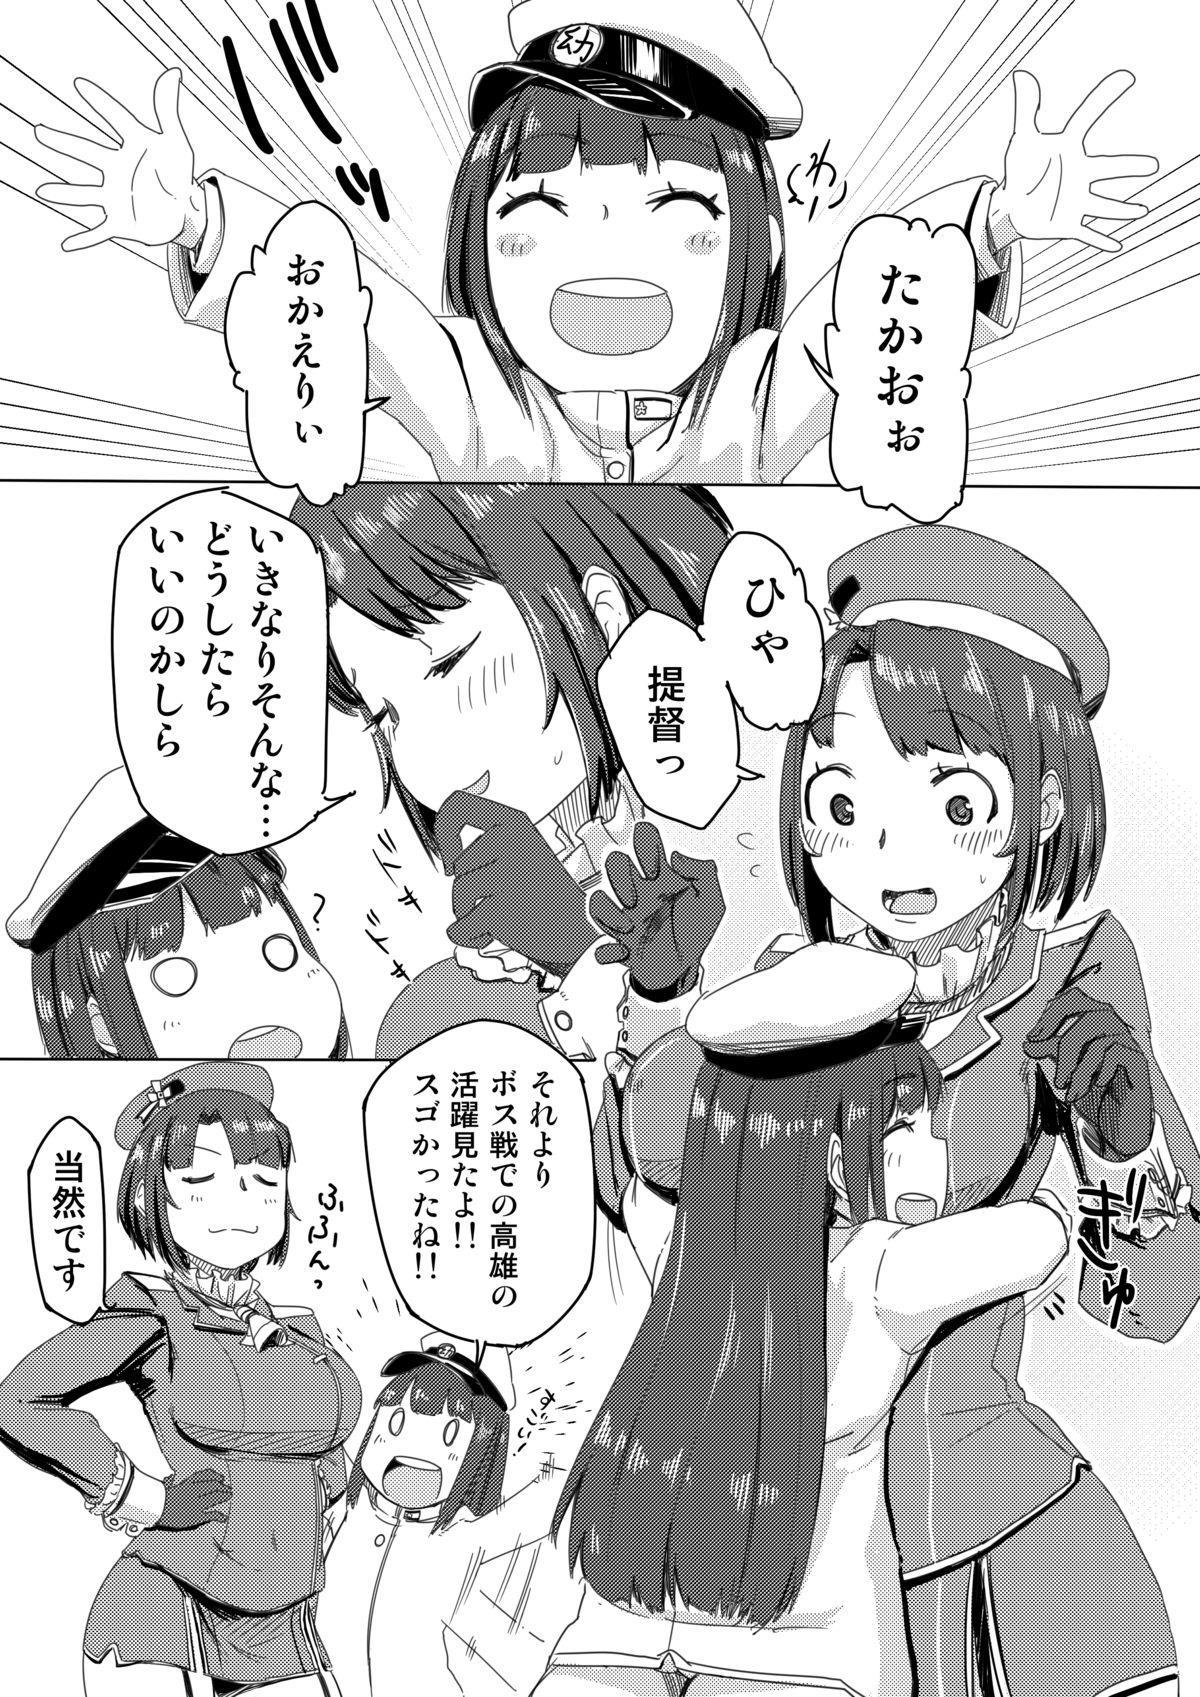 Teitoku to Takao-san Milk 1